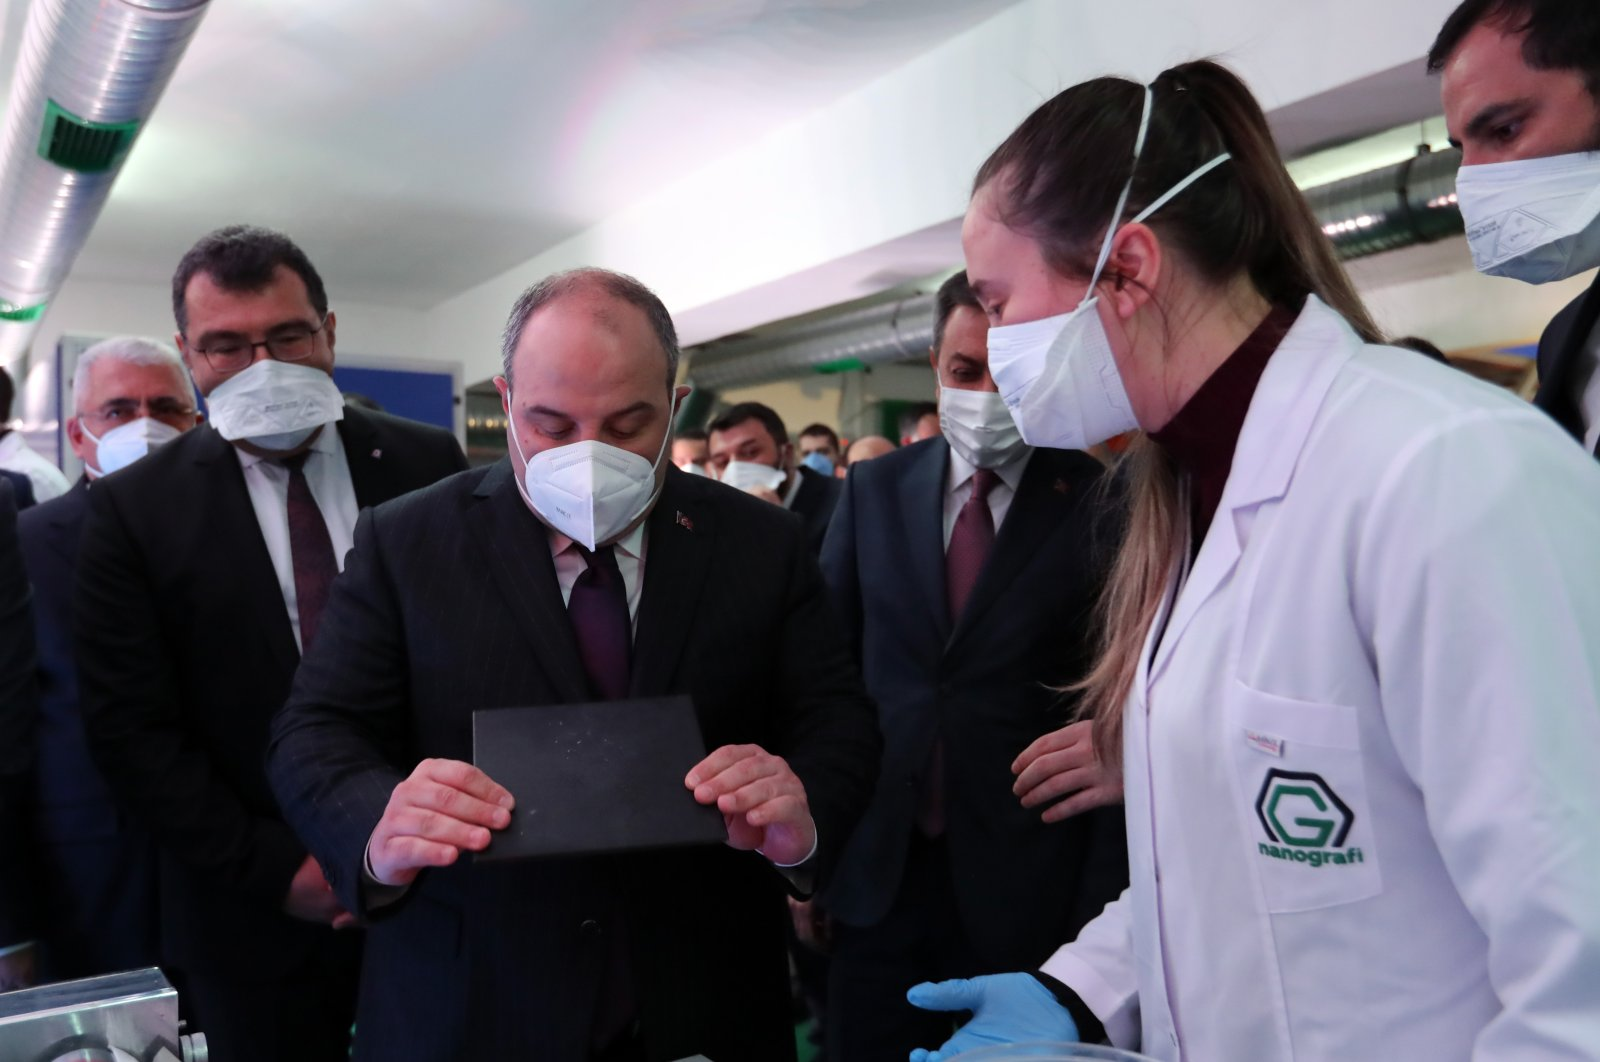 Industry and Technology Minister Mustafa Varank on the sidelines of the opening ceremony of Nanografi'snew graphene production plant, Ankara, Turkey, March 30, 2021. (Industry and Technology Ministry Photo via AA)